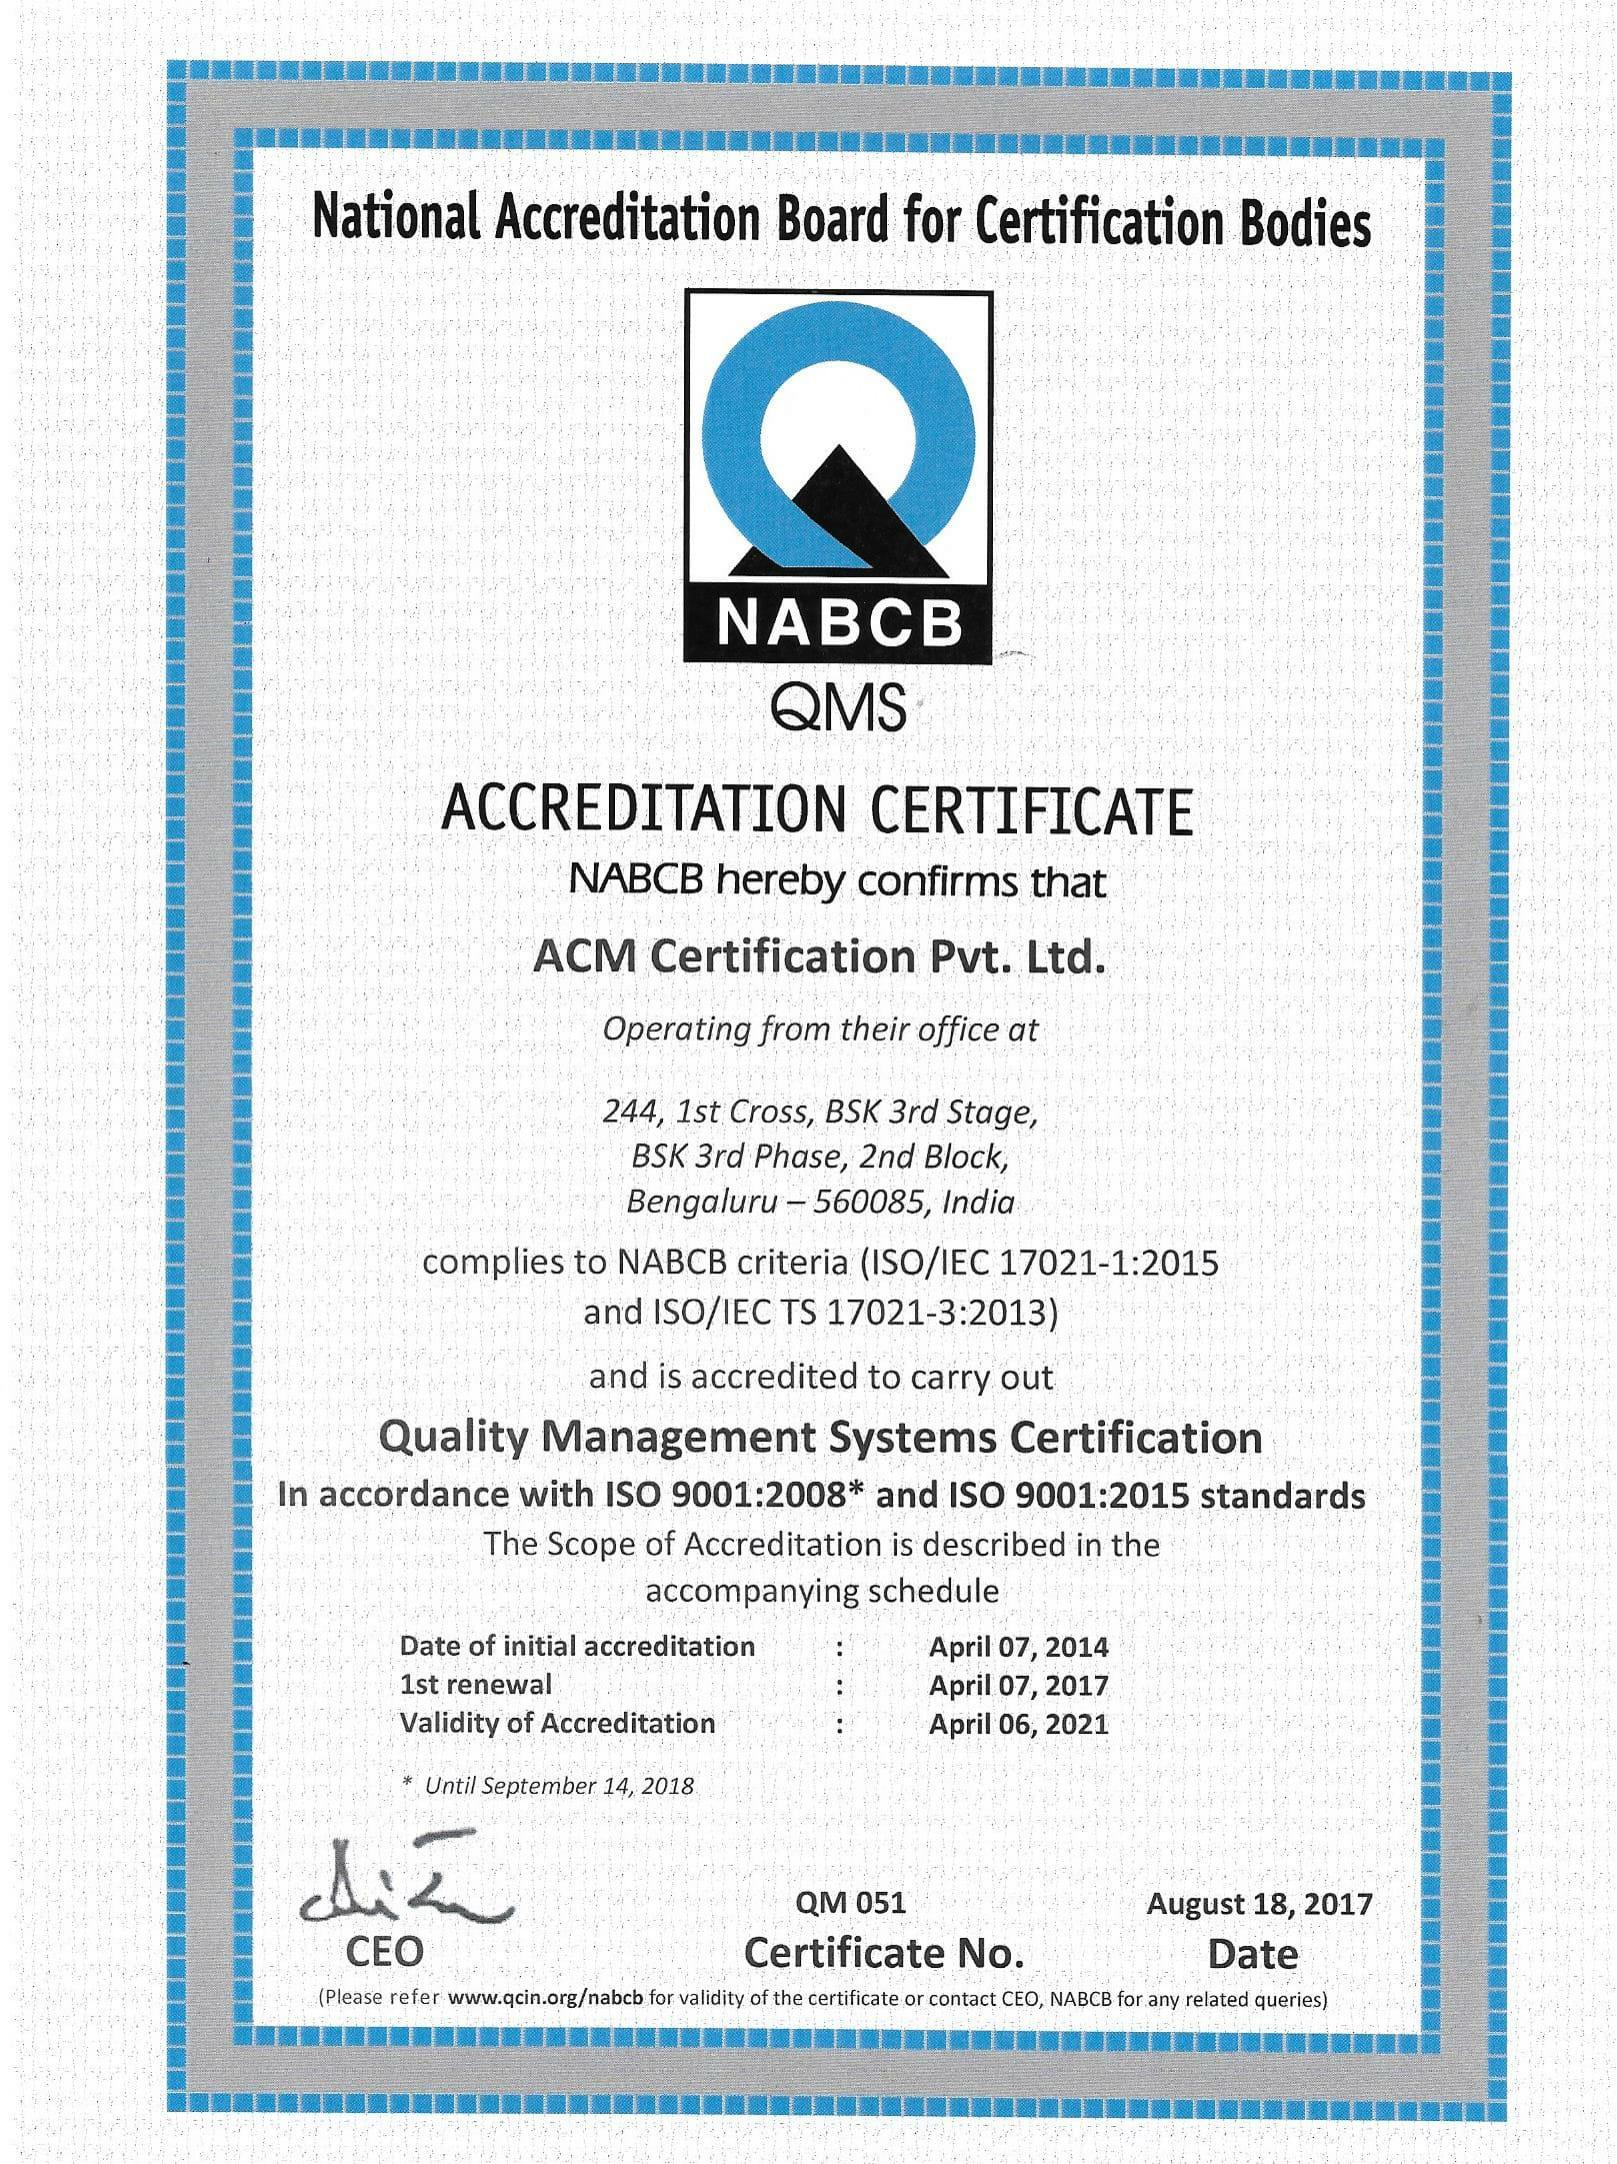 certification acm certificate